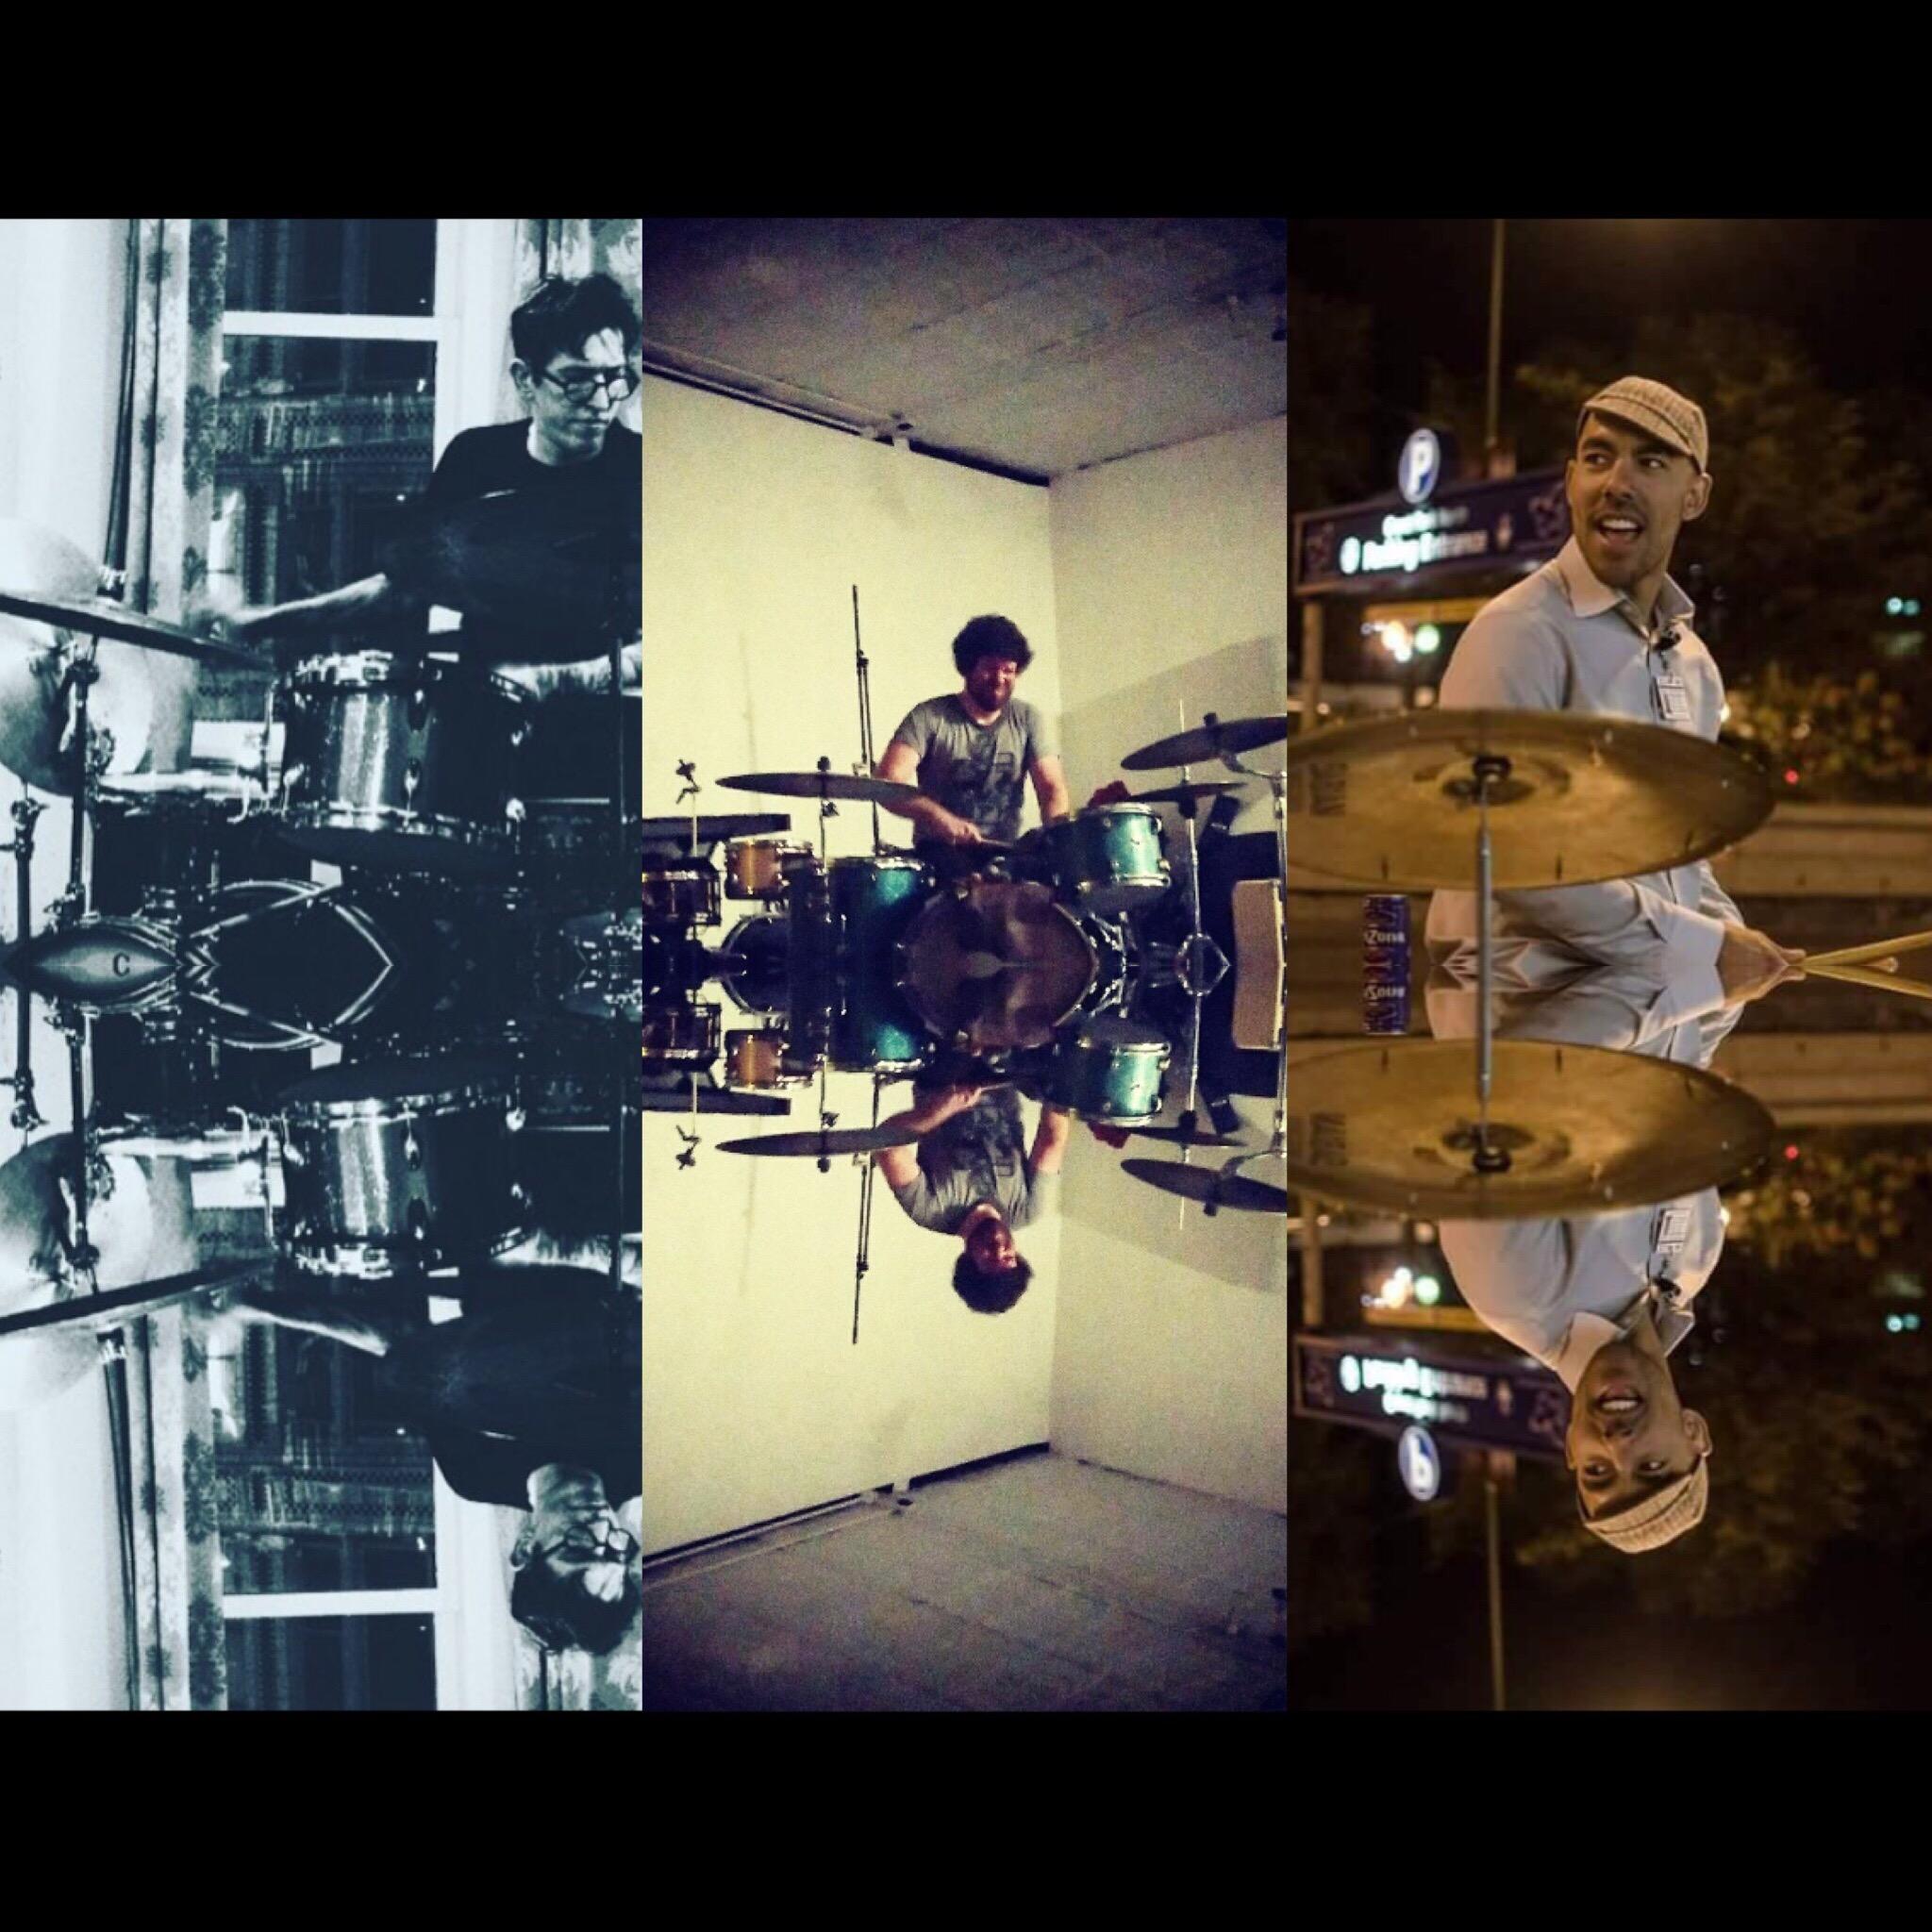 Mirrored series featuring Alvarez-Billington-Rowe